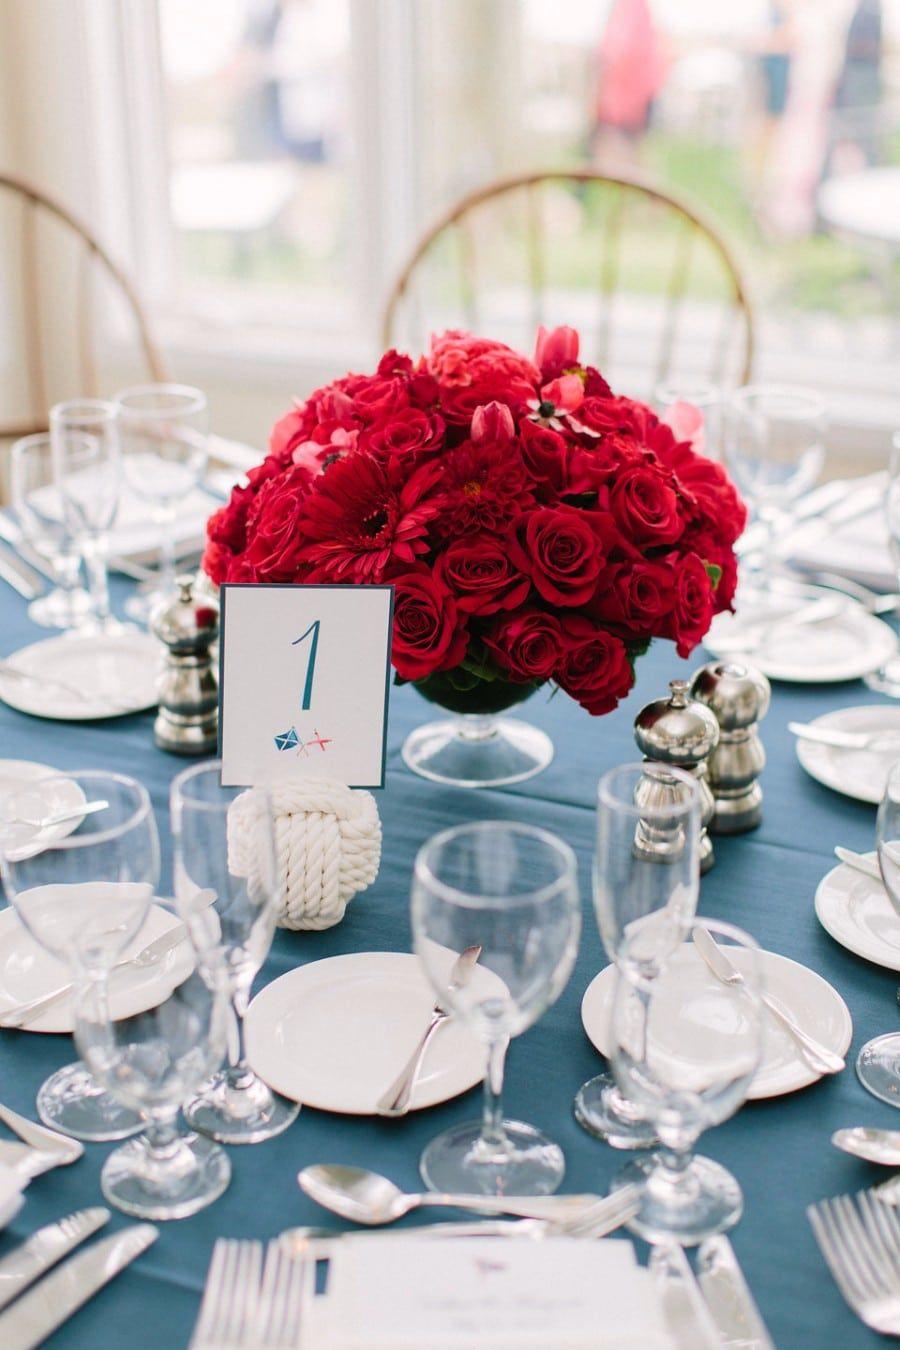 Real Wedding: Margaret + Vaibhav | Yacht club, Unique wedding ...